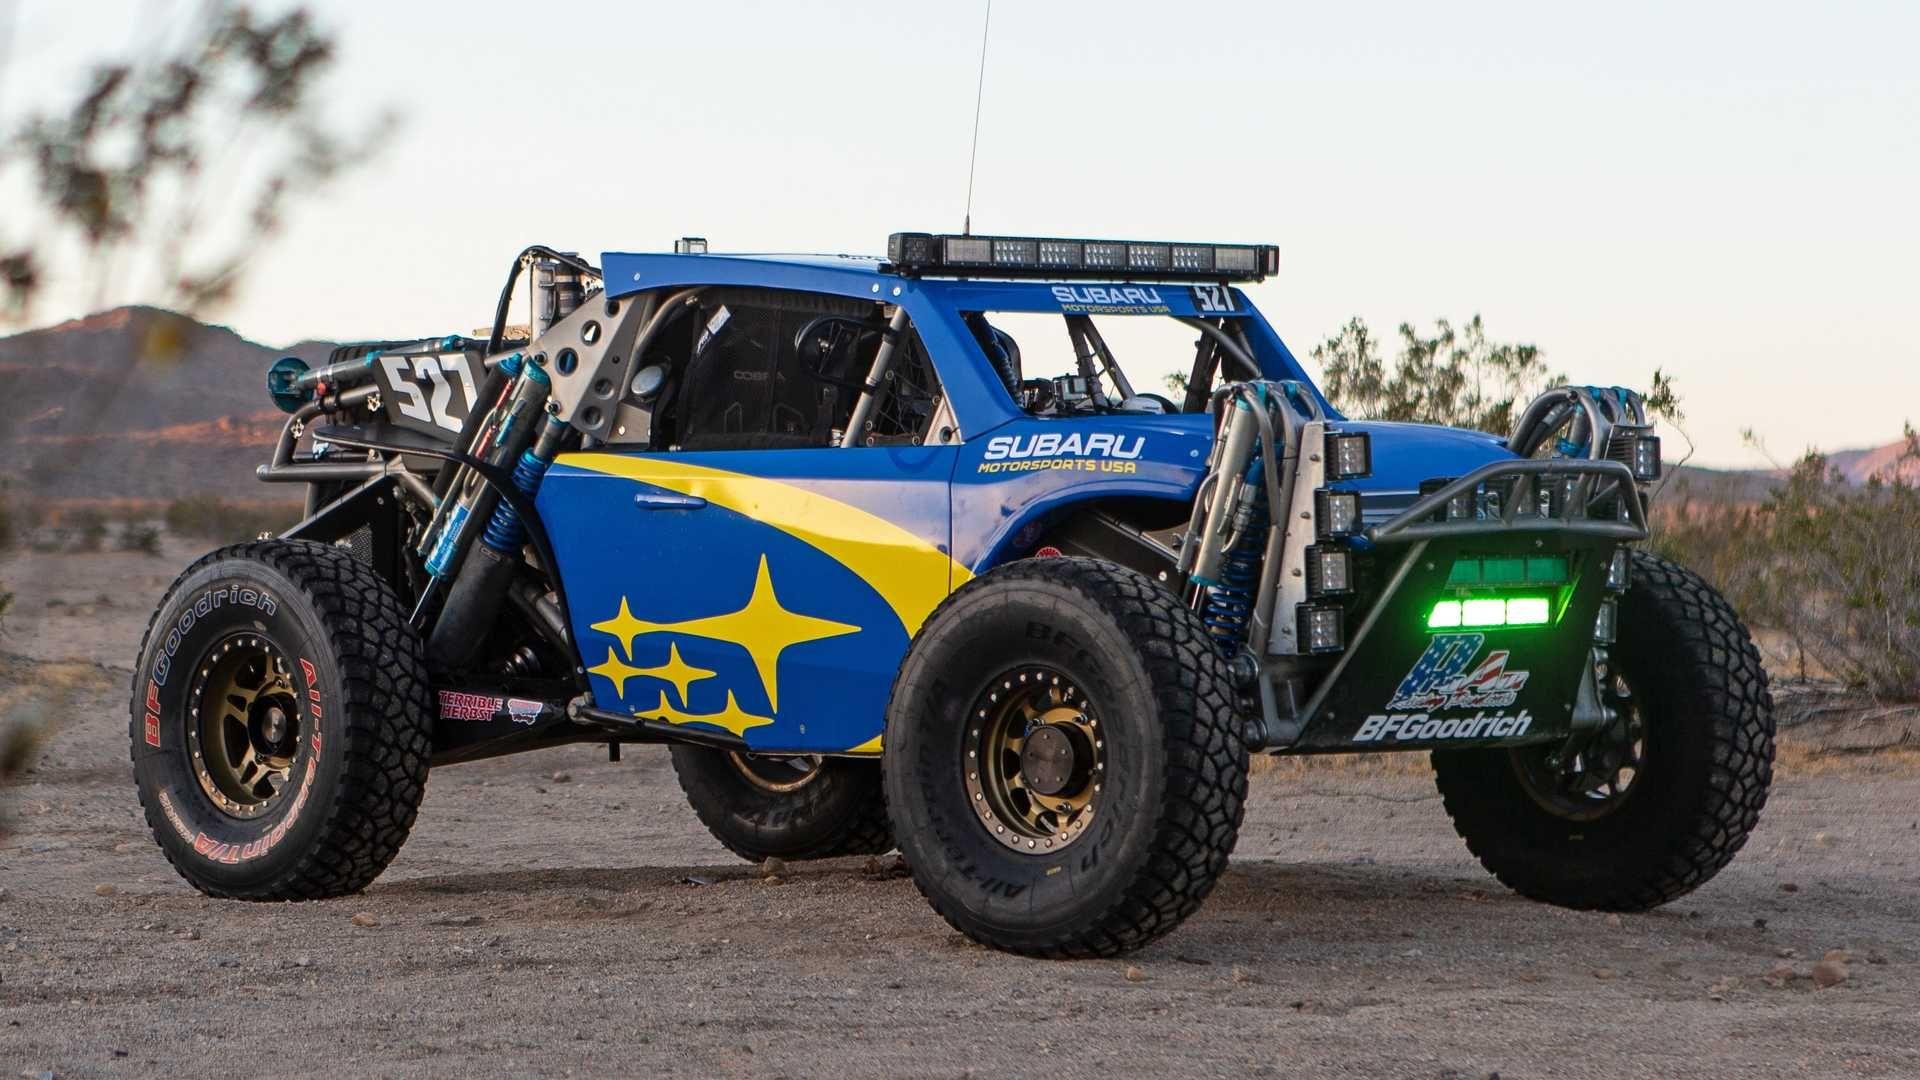 Subaru Crosstrek Desert Racer Looks Ready To Beat Baja Subaru Crosstrek Subaru Offroad Vehicles